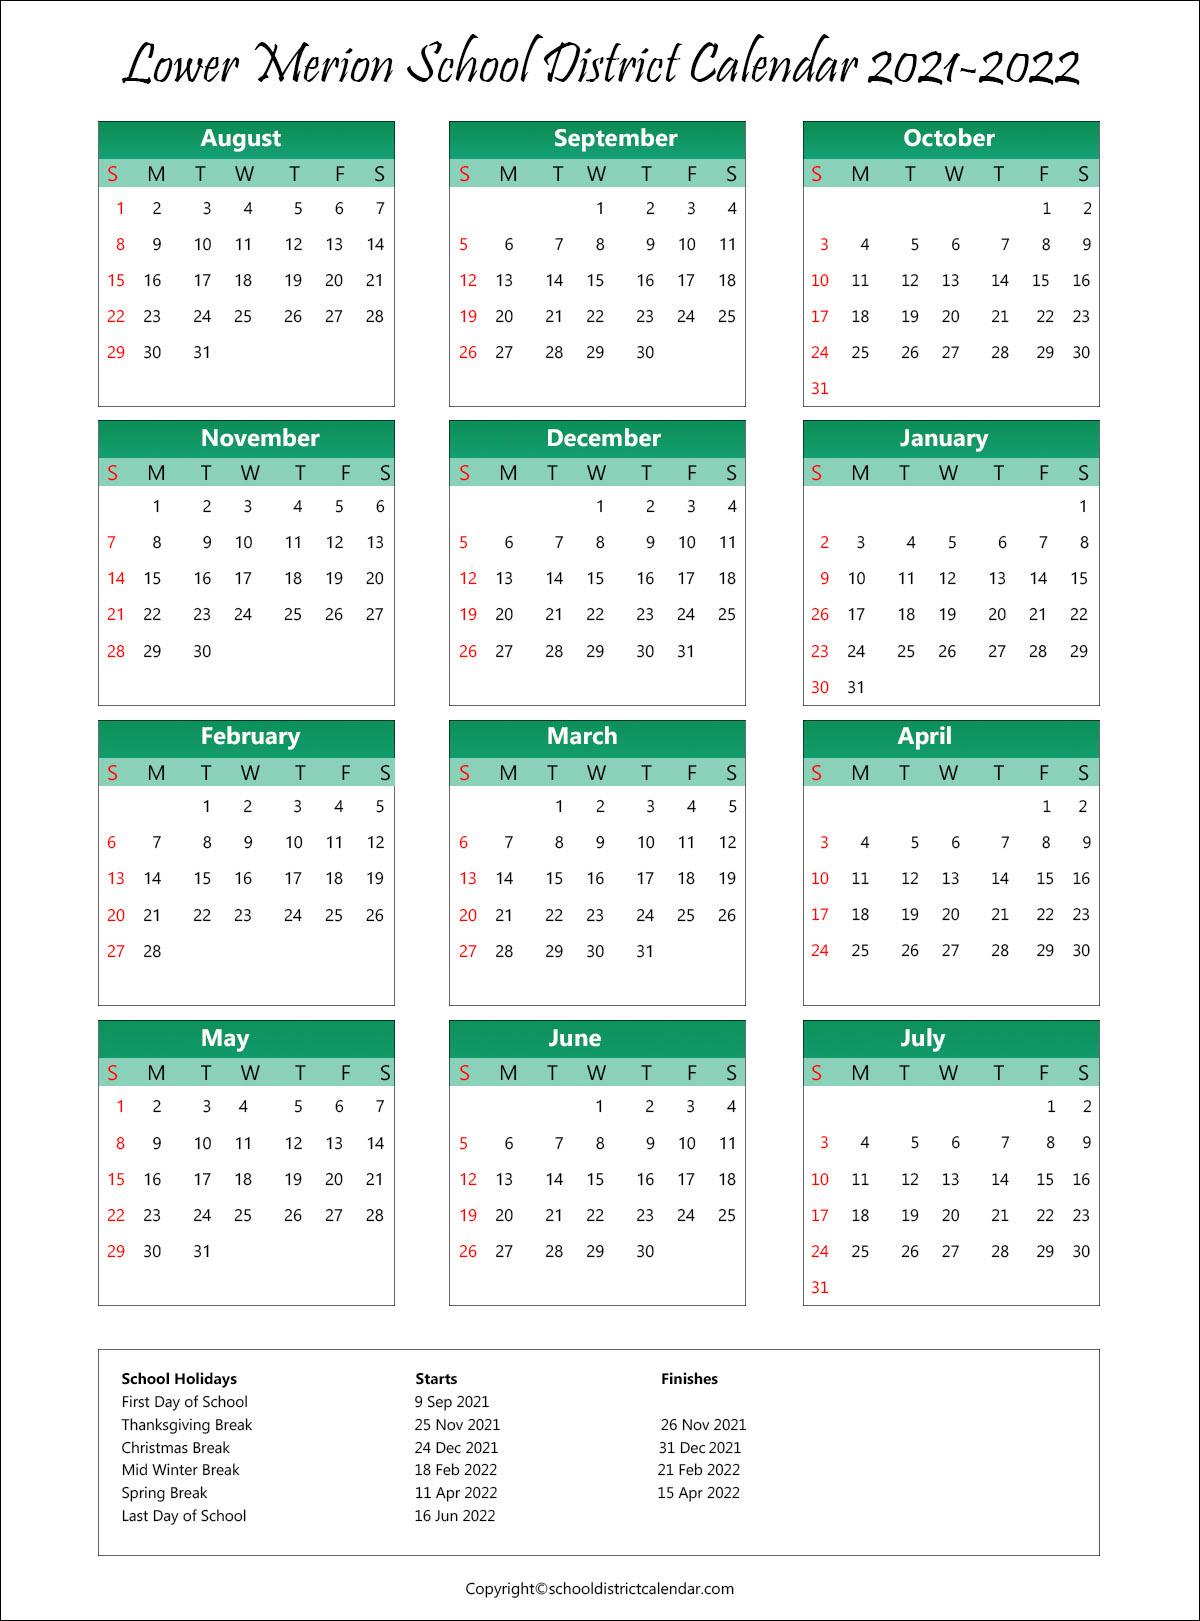 Lower Merion School District, Pennsylvania Calendar Holidays 2021